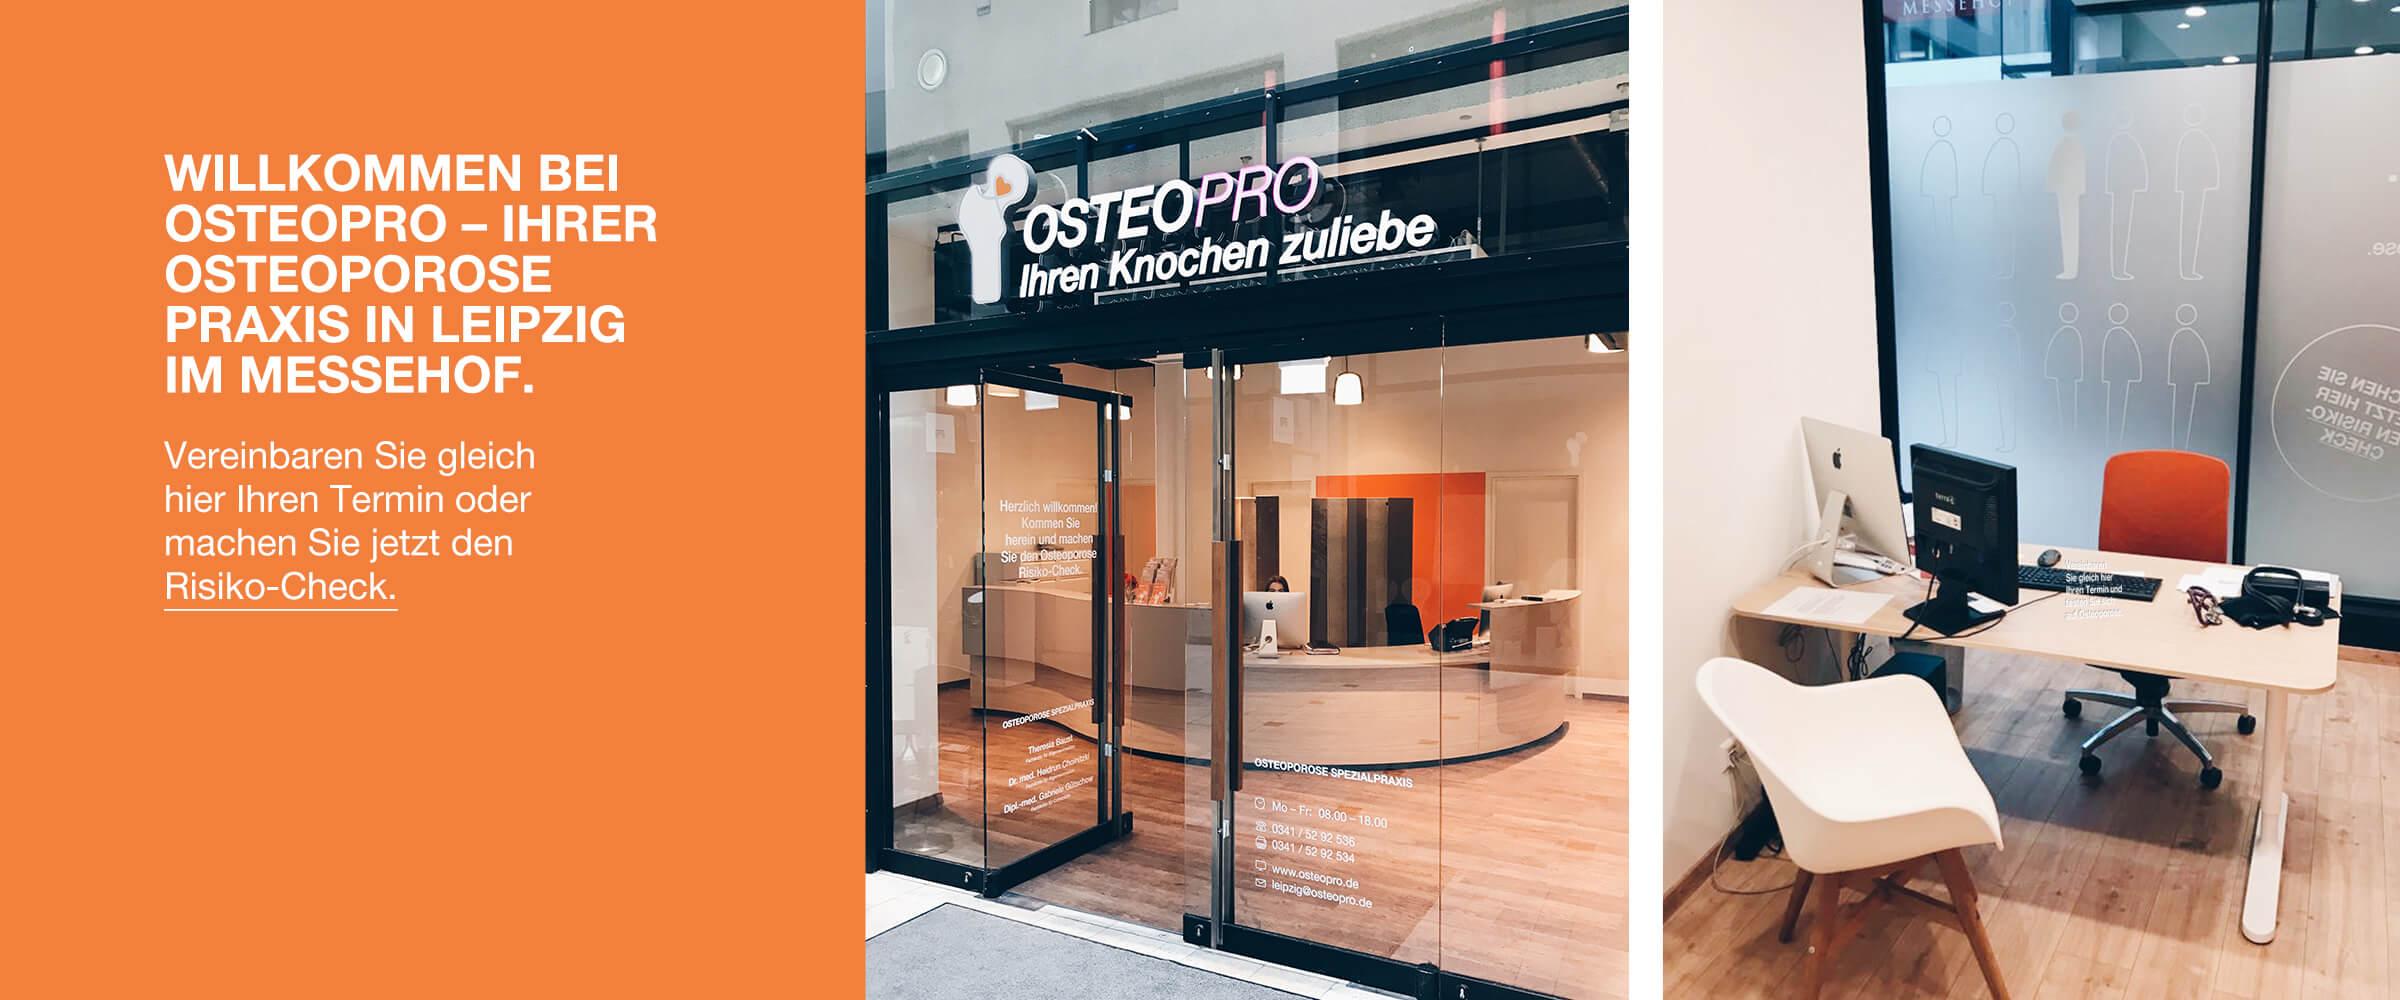 OsteoPro Osteoporose Spezialpraxis Leipzig Messehof